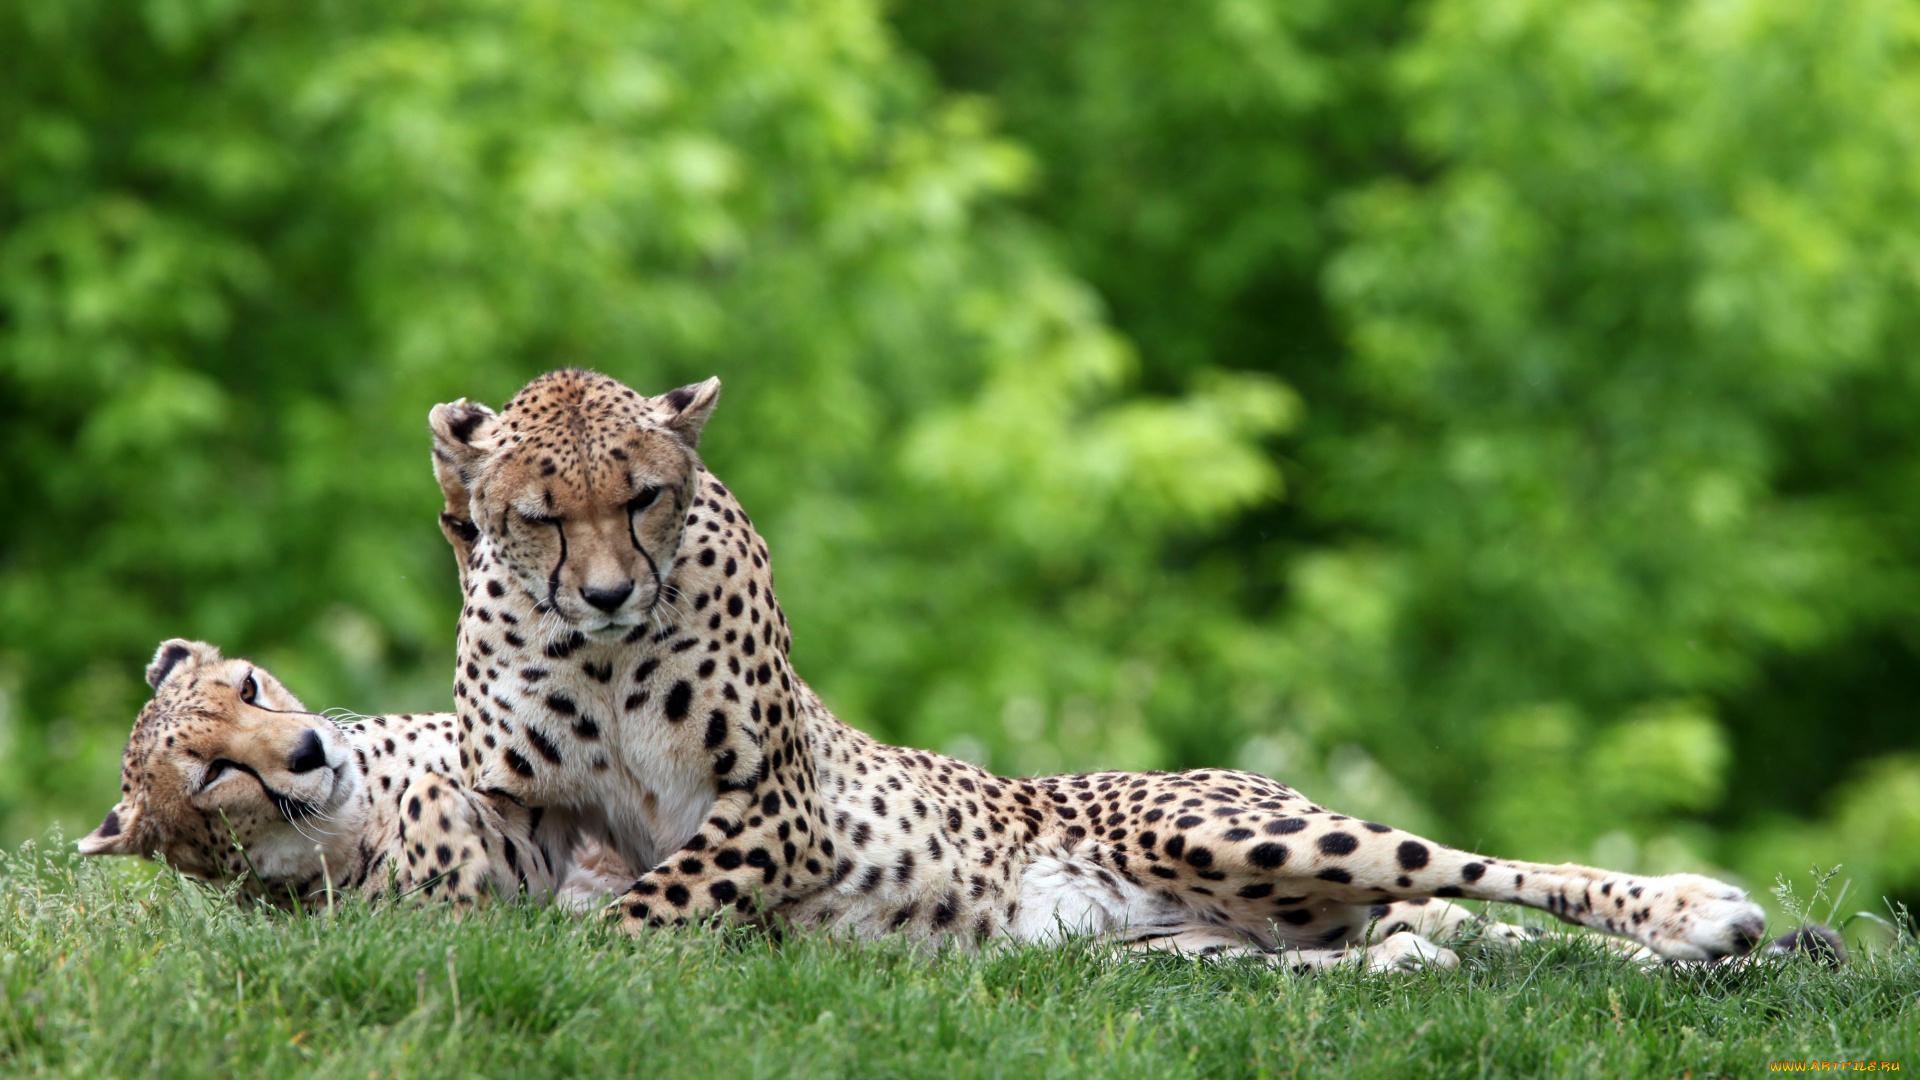 Леопард в траве без смс